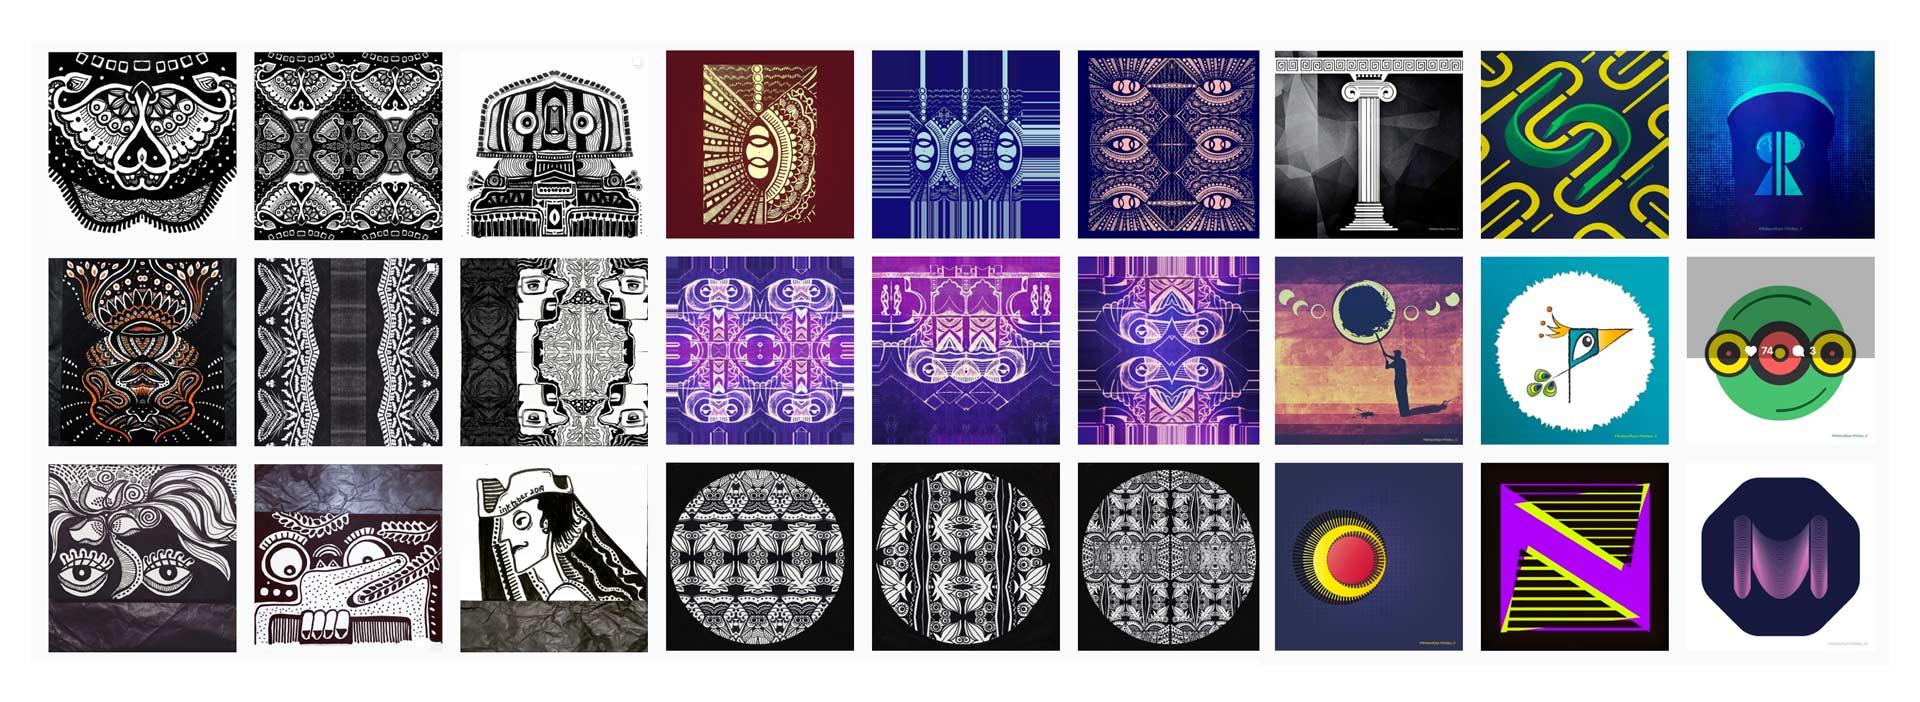 Pattern Gram Taniya Vij